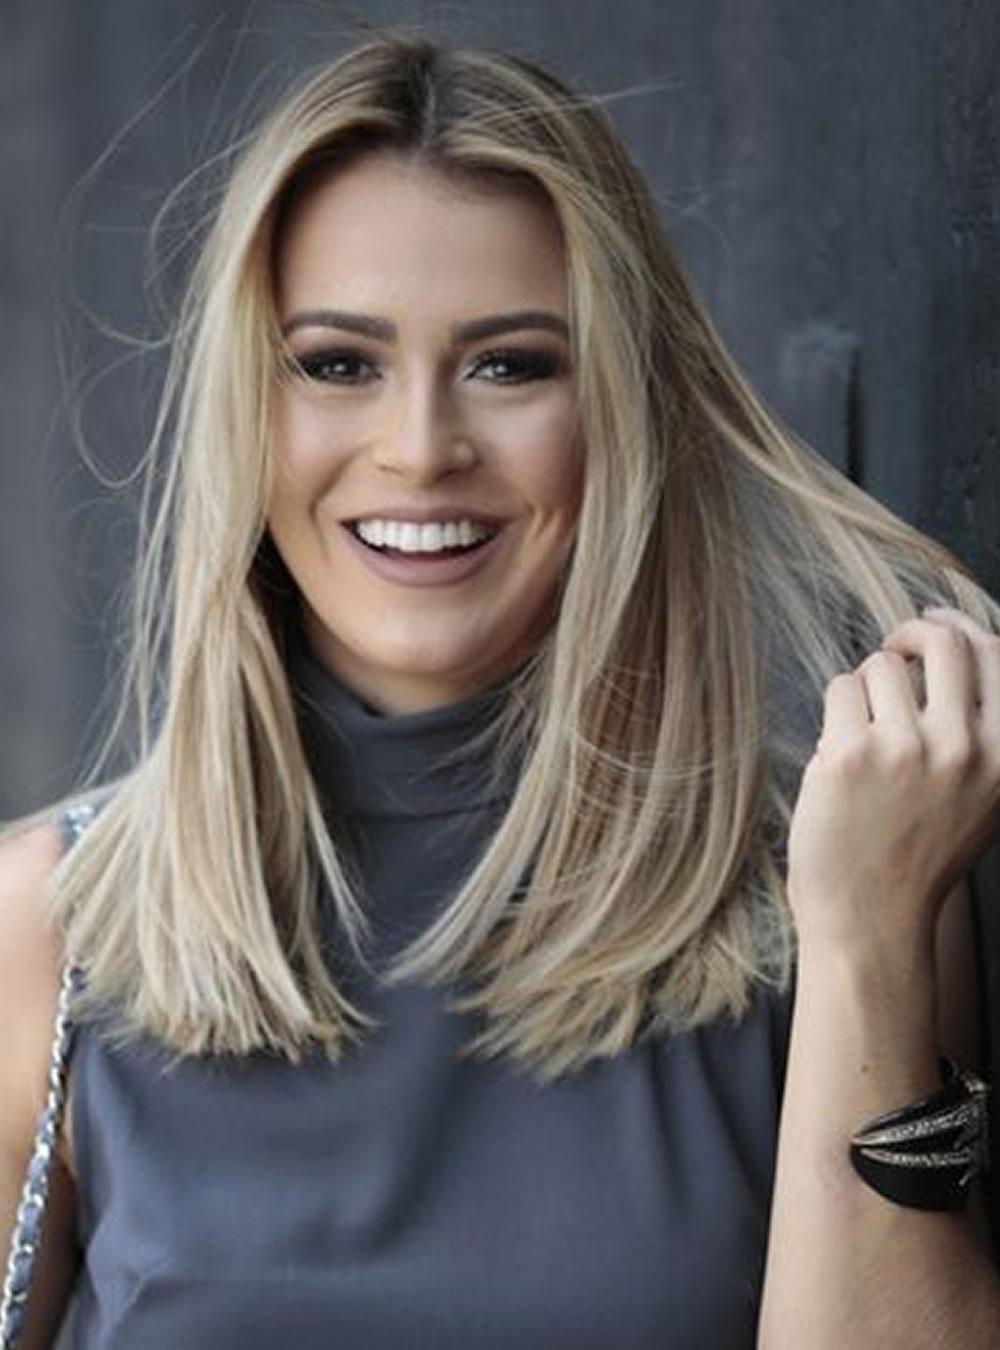 Medium Length Haircuts and Hair Color Ideas - Medium Hair 7